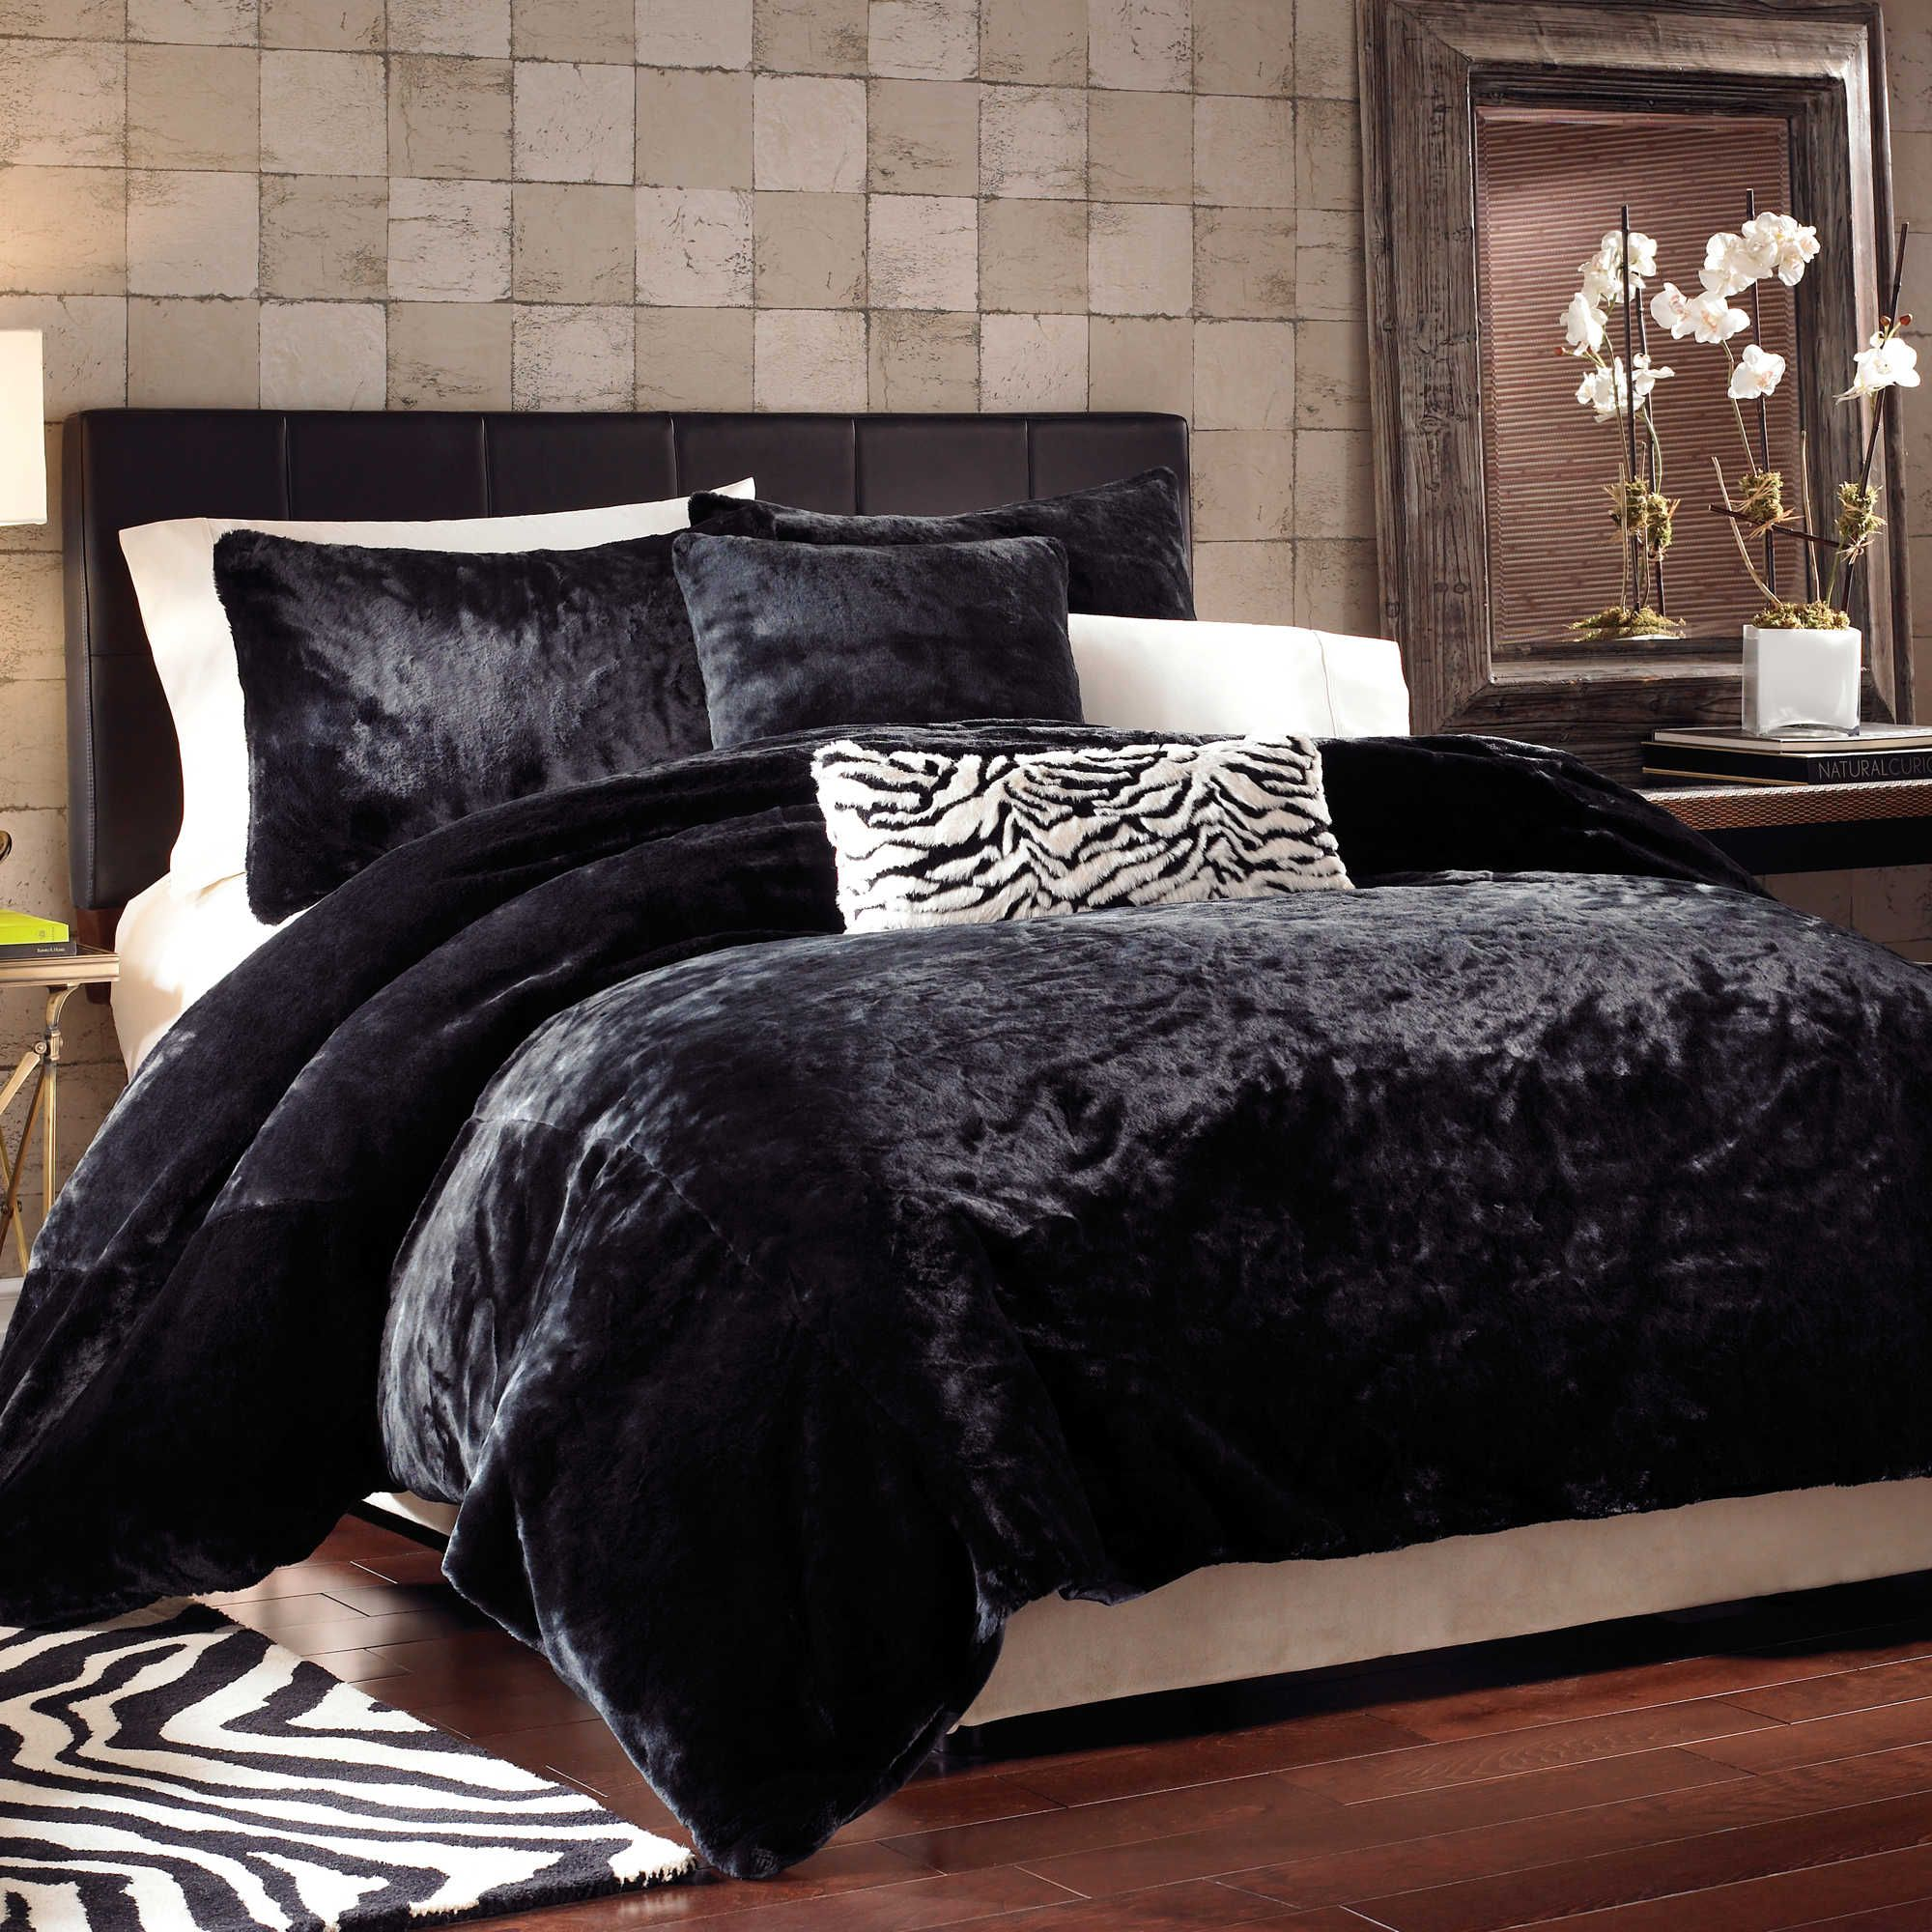 Black Panther Faux Fur Duvet Cover Schwarzer Panther Fellimitat Bettbezug Duvet Cover Sets Home Queen Bedding Sets